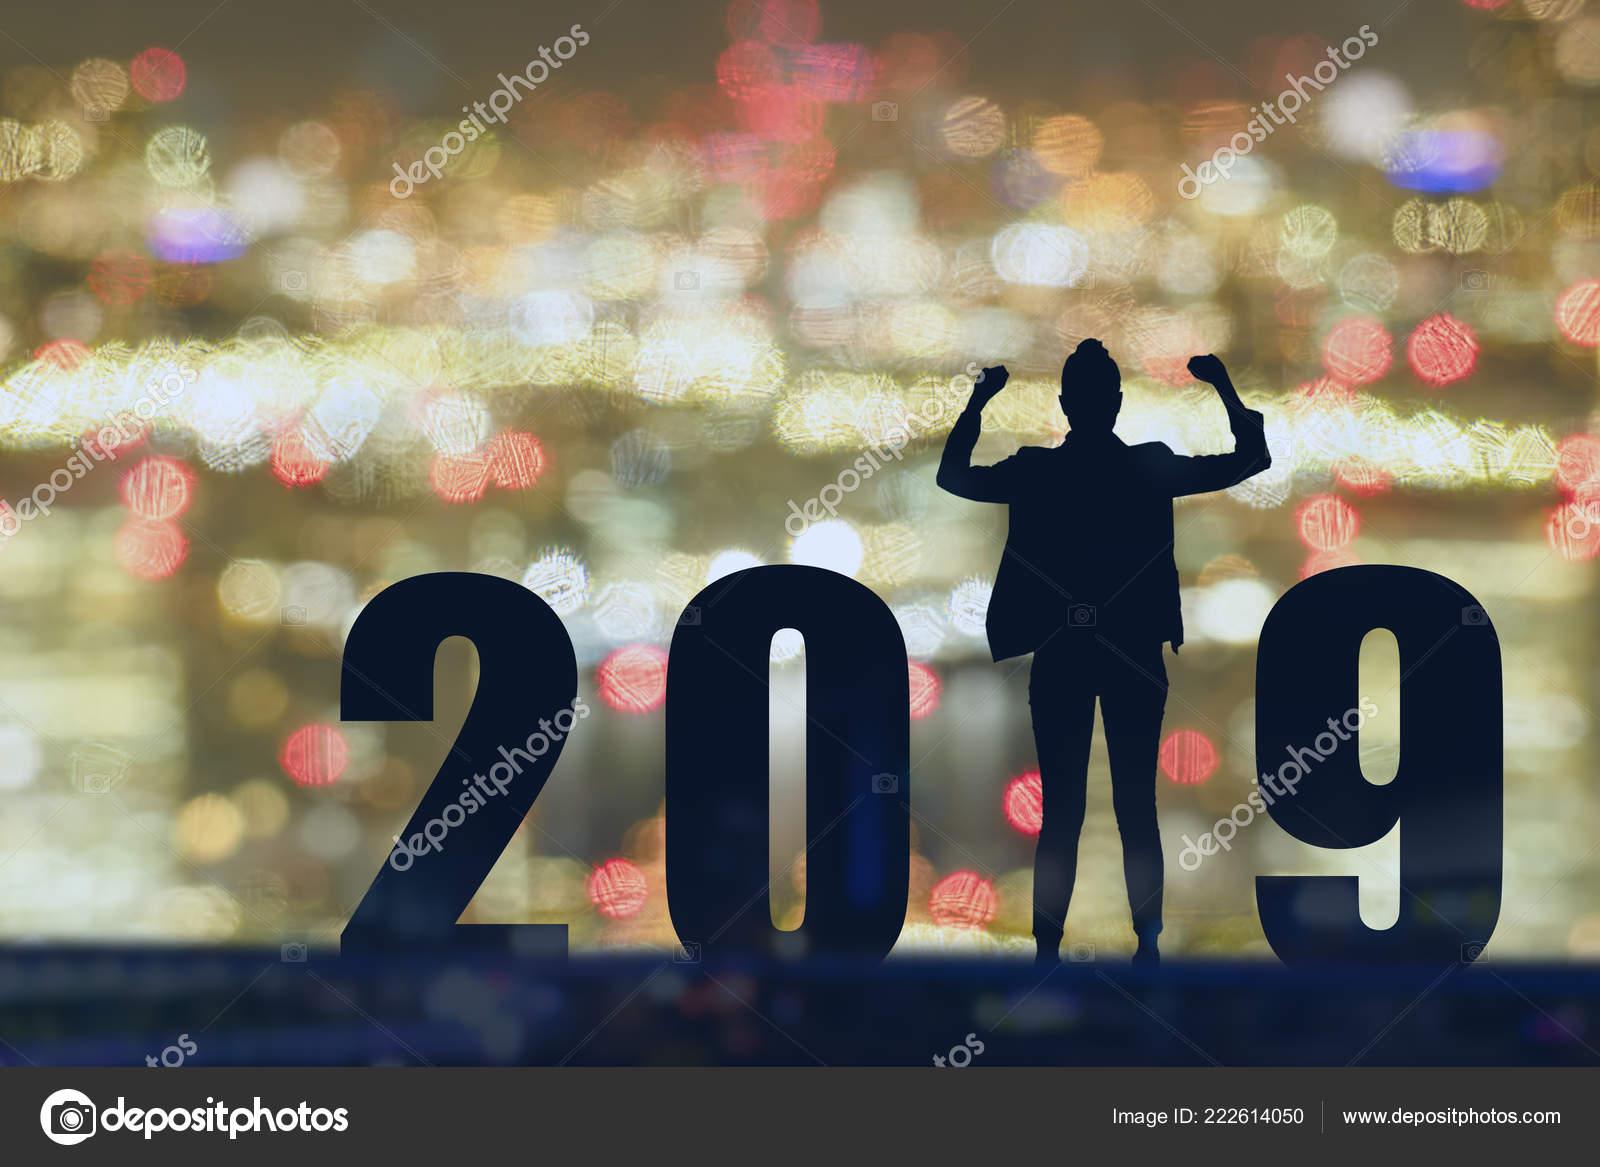 73cb480c30d3 Celebrando Año Nuevo 2019 Silueta Libertad Joven Esperanza Hombre ...